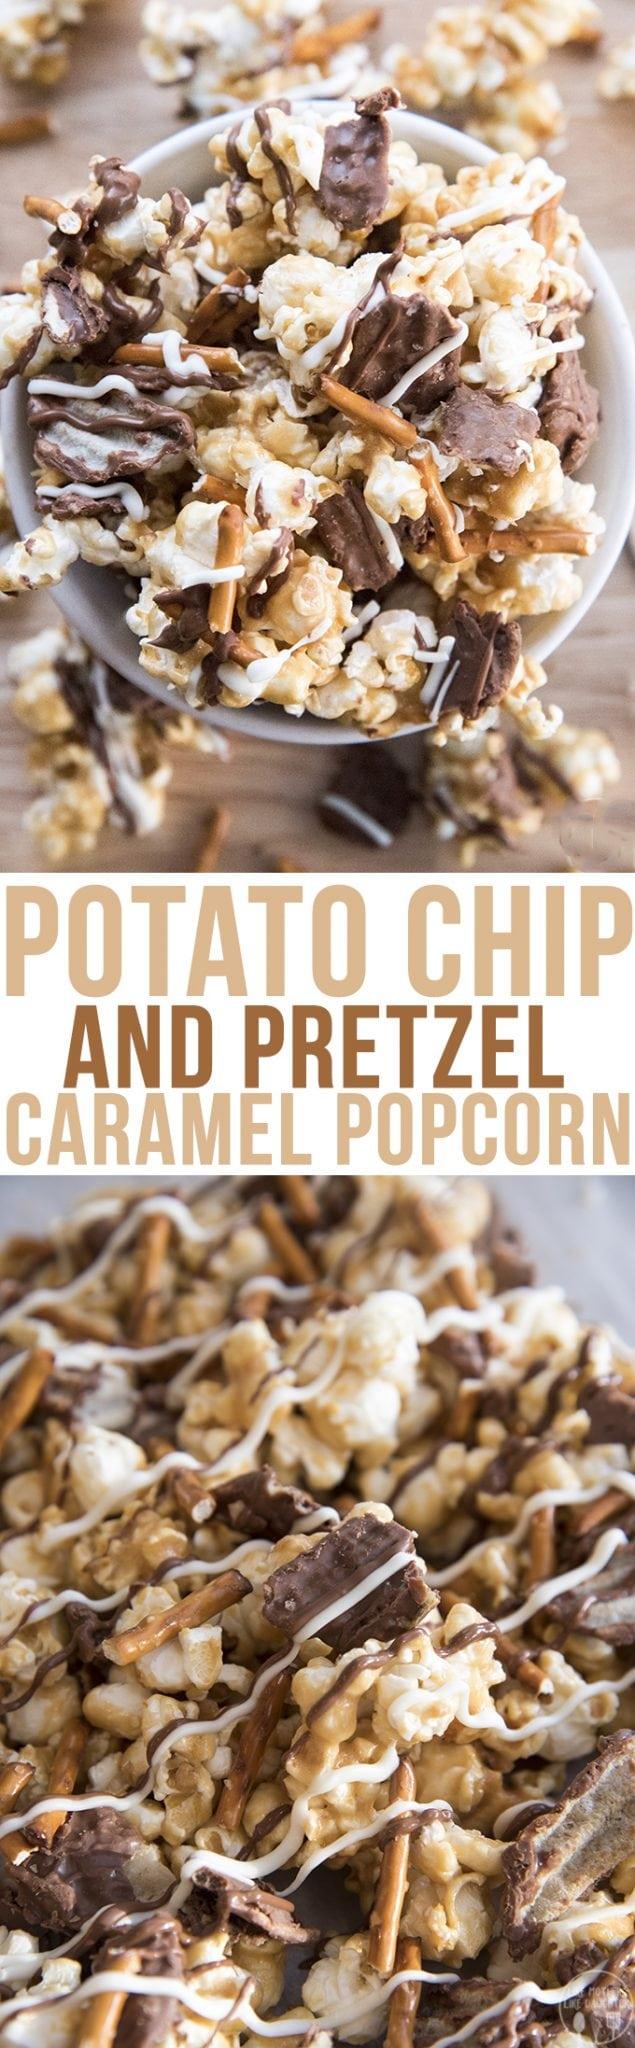 Potato Chip Caramel Popcorn – Like Mother, Like Daughter